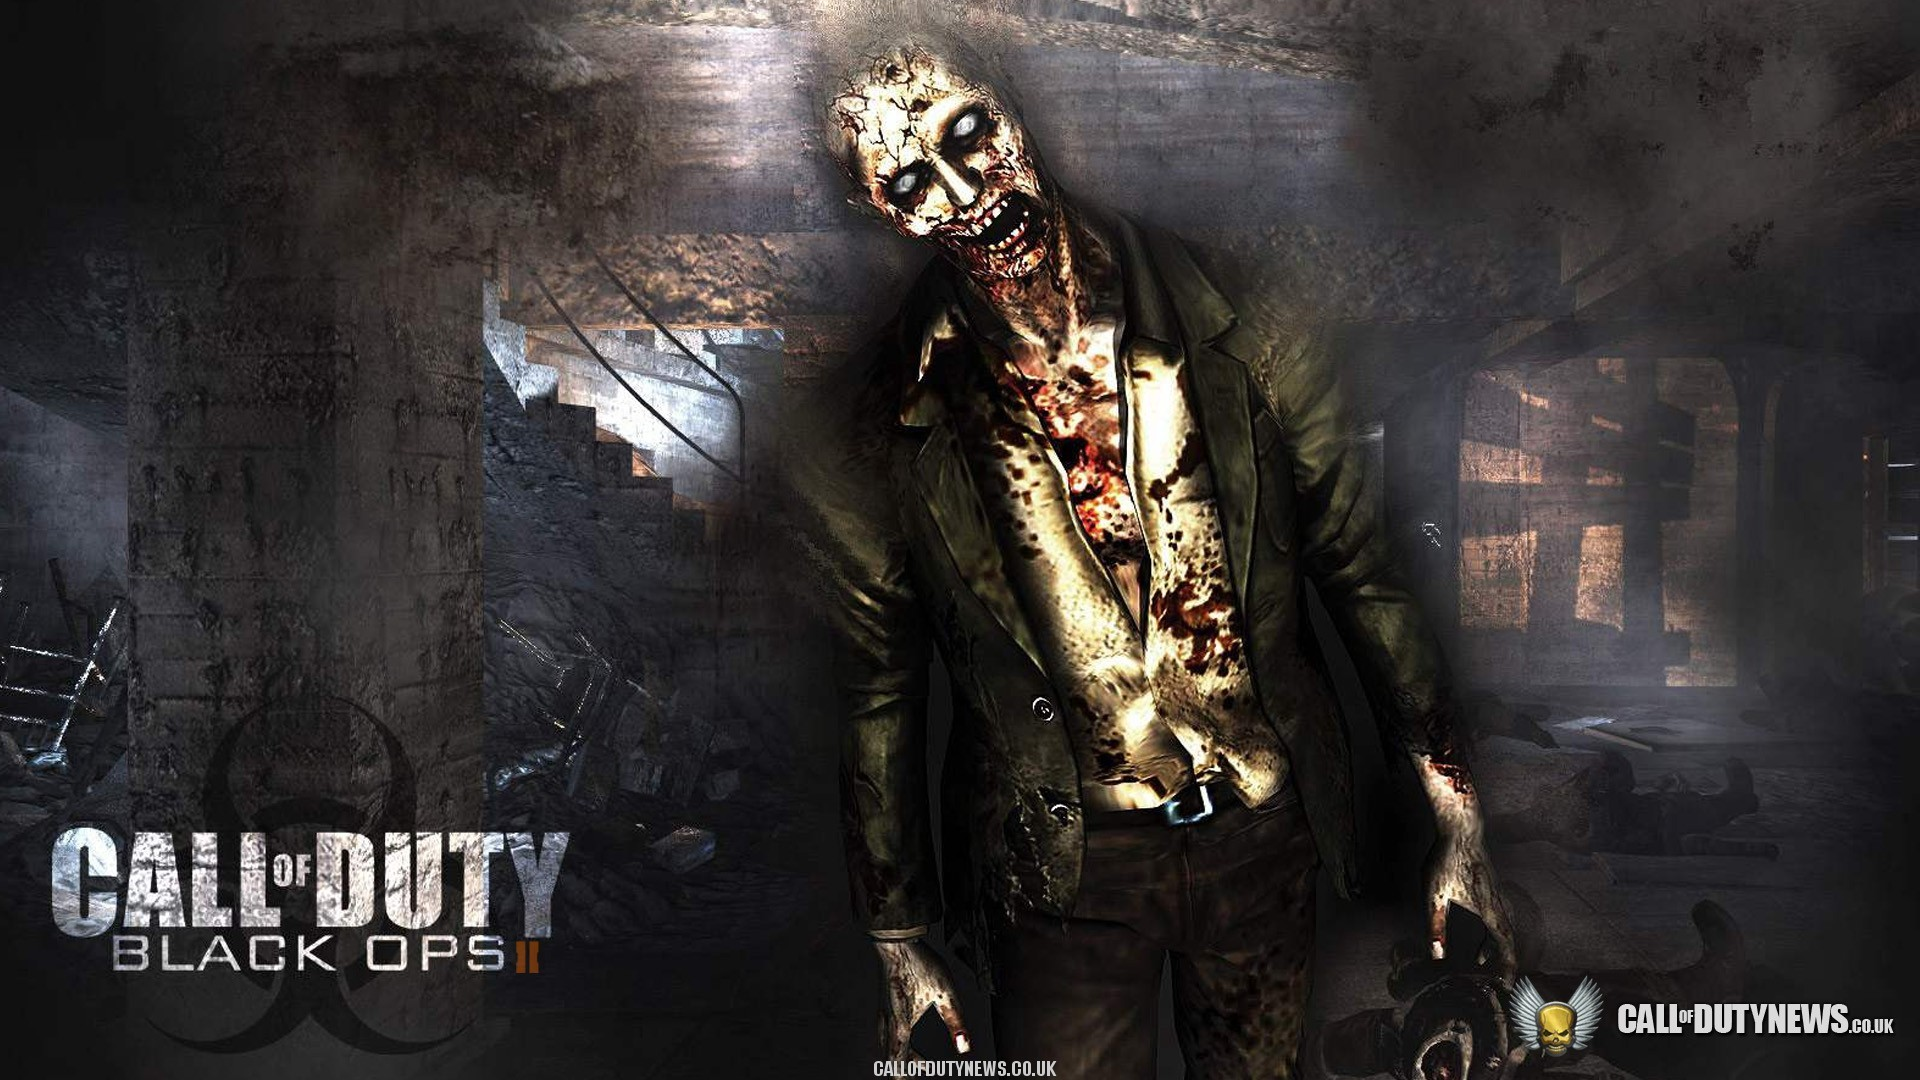 Call Of Duty: Black Ops II Wallpapers Wallpaper Black Ops 2 Wallpapers  Wallpapers)